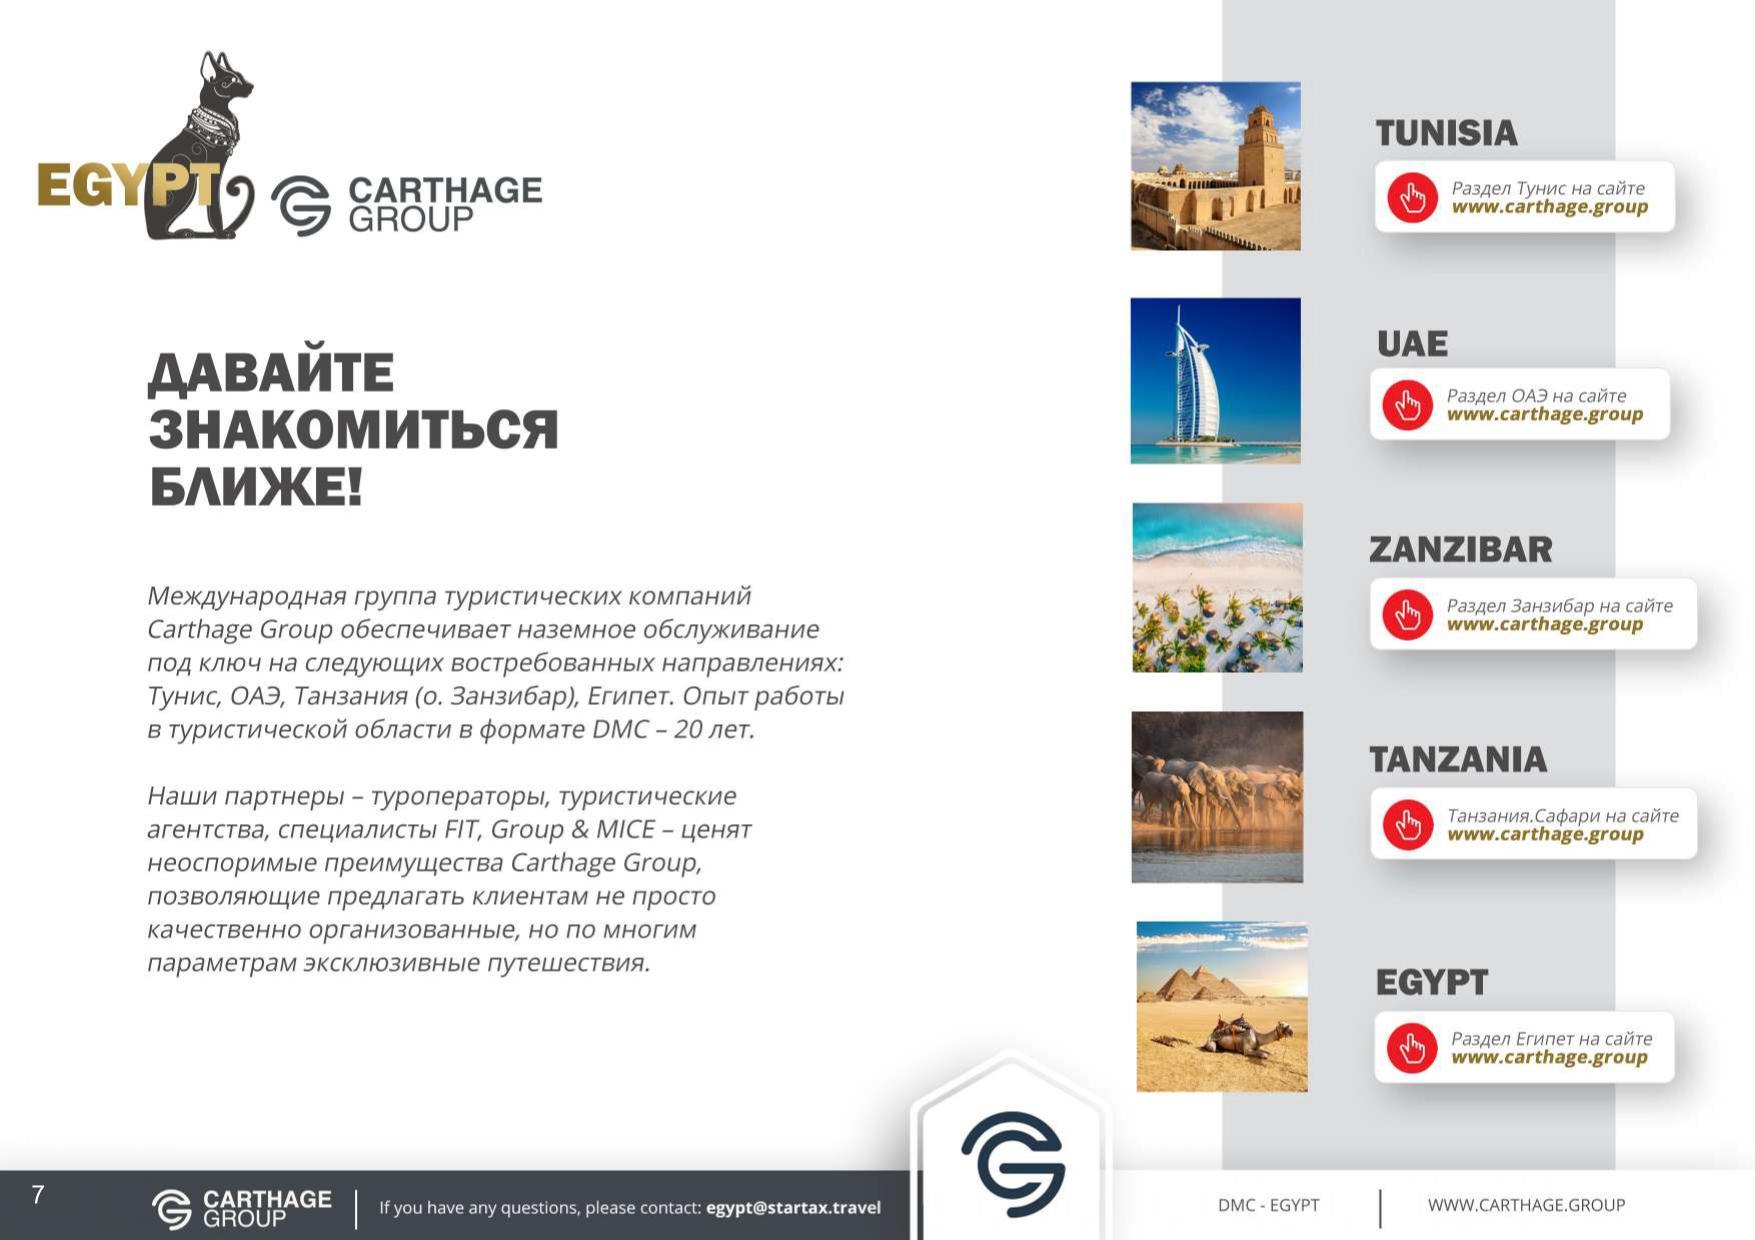 Картаж_Египет_2021-сылки_page-0007